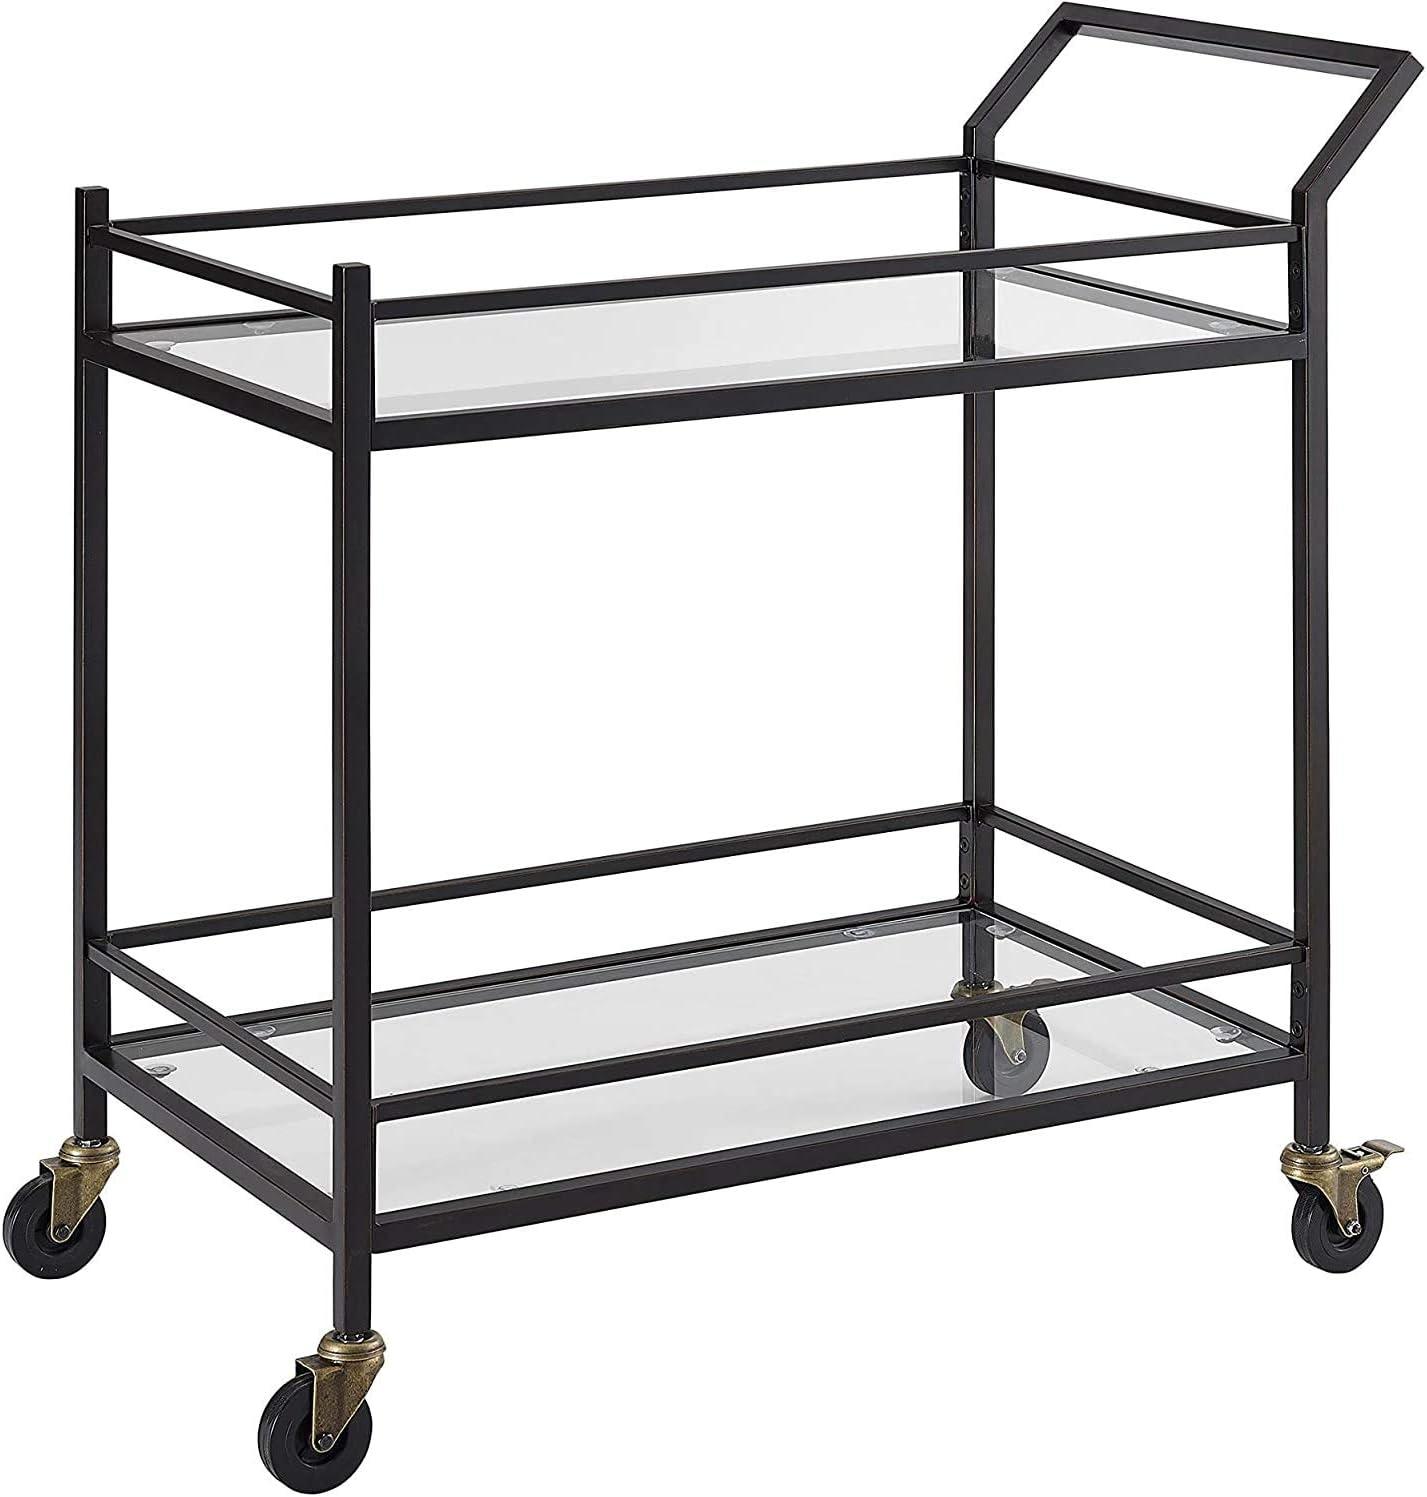 Crosley Furniture Aimee Rolling Bar Cart, Oil-Rubbed Bronze